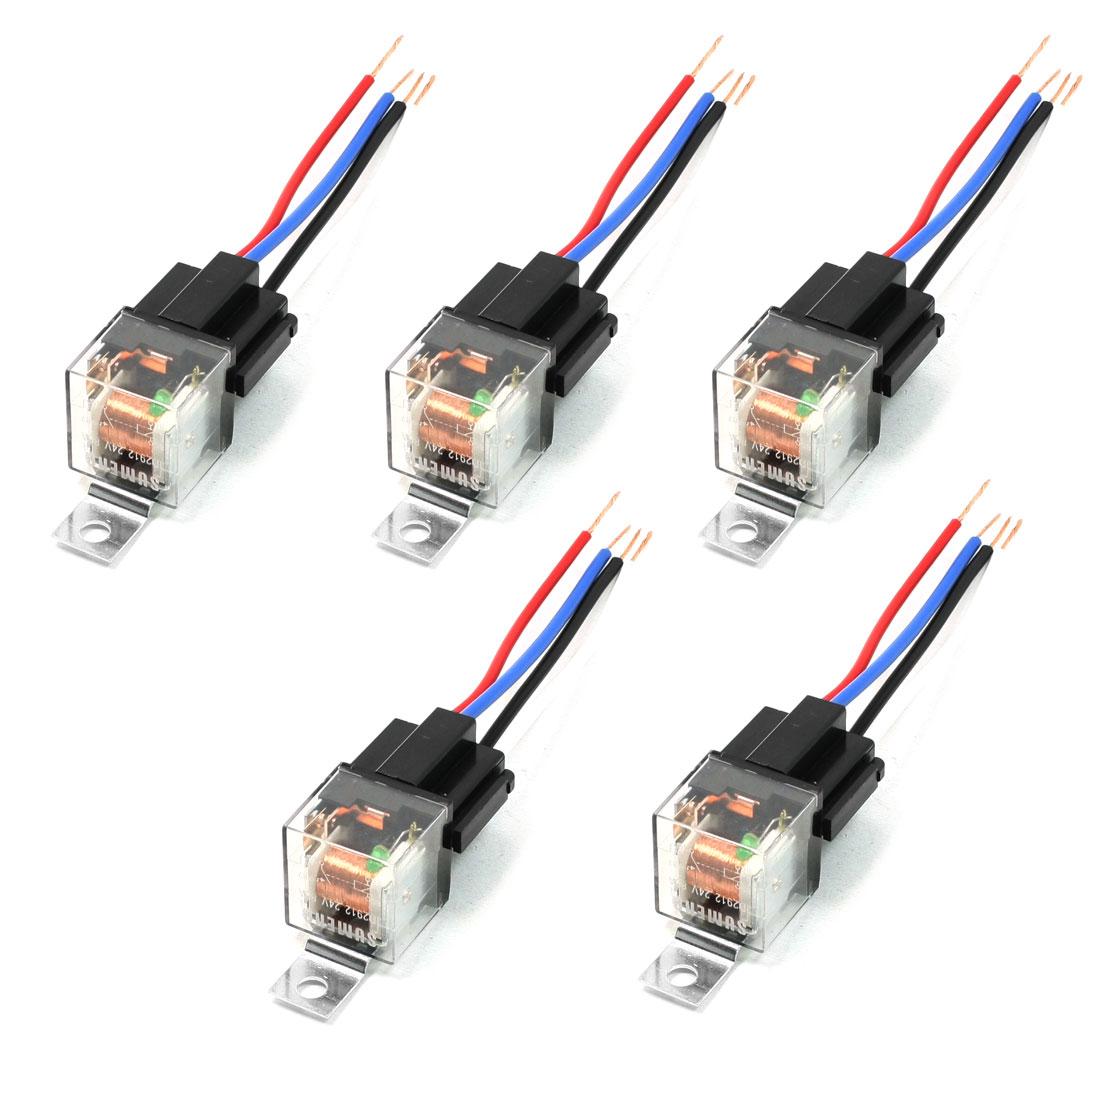 5PCS 4 Wire Insulation Housing Green Pilot Lamp SPST JD2912 Car Relay 24VDC 80A